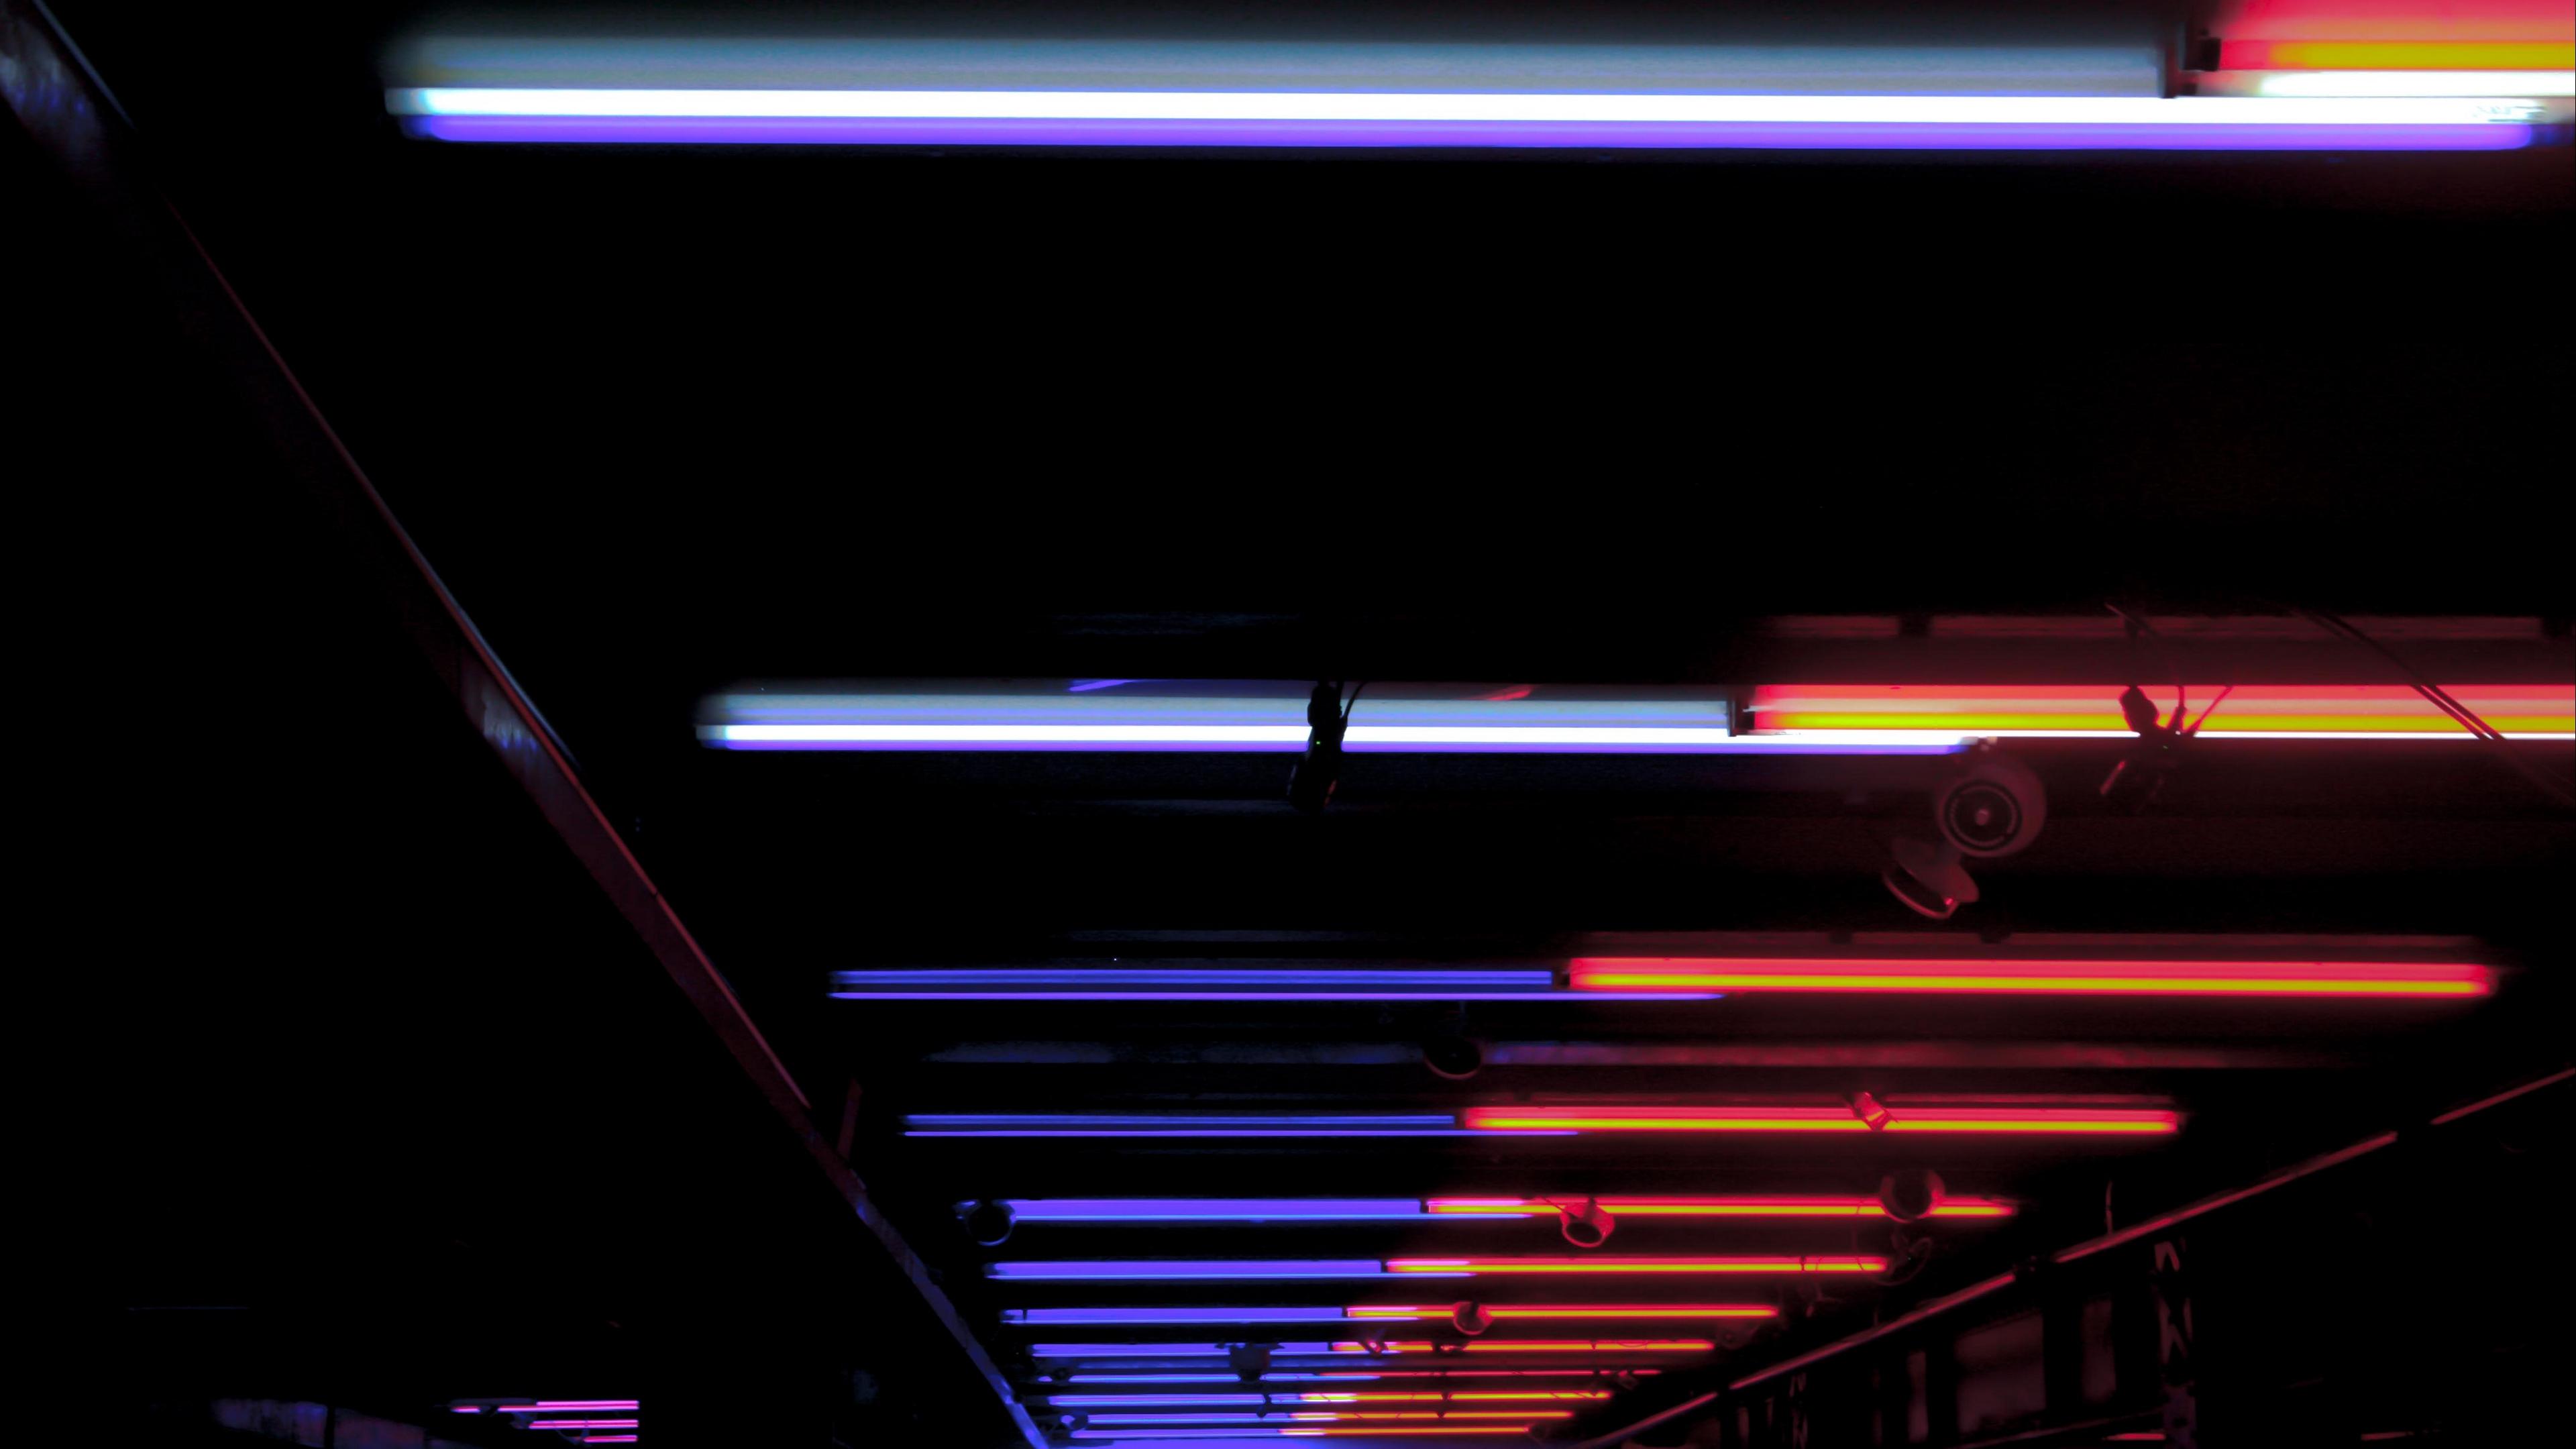 ceiling lighting night neon 4k 1540575059 - ceiling, lighting, night, neon 4k - Night, Lighting, Ceiling